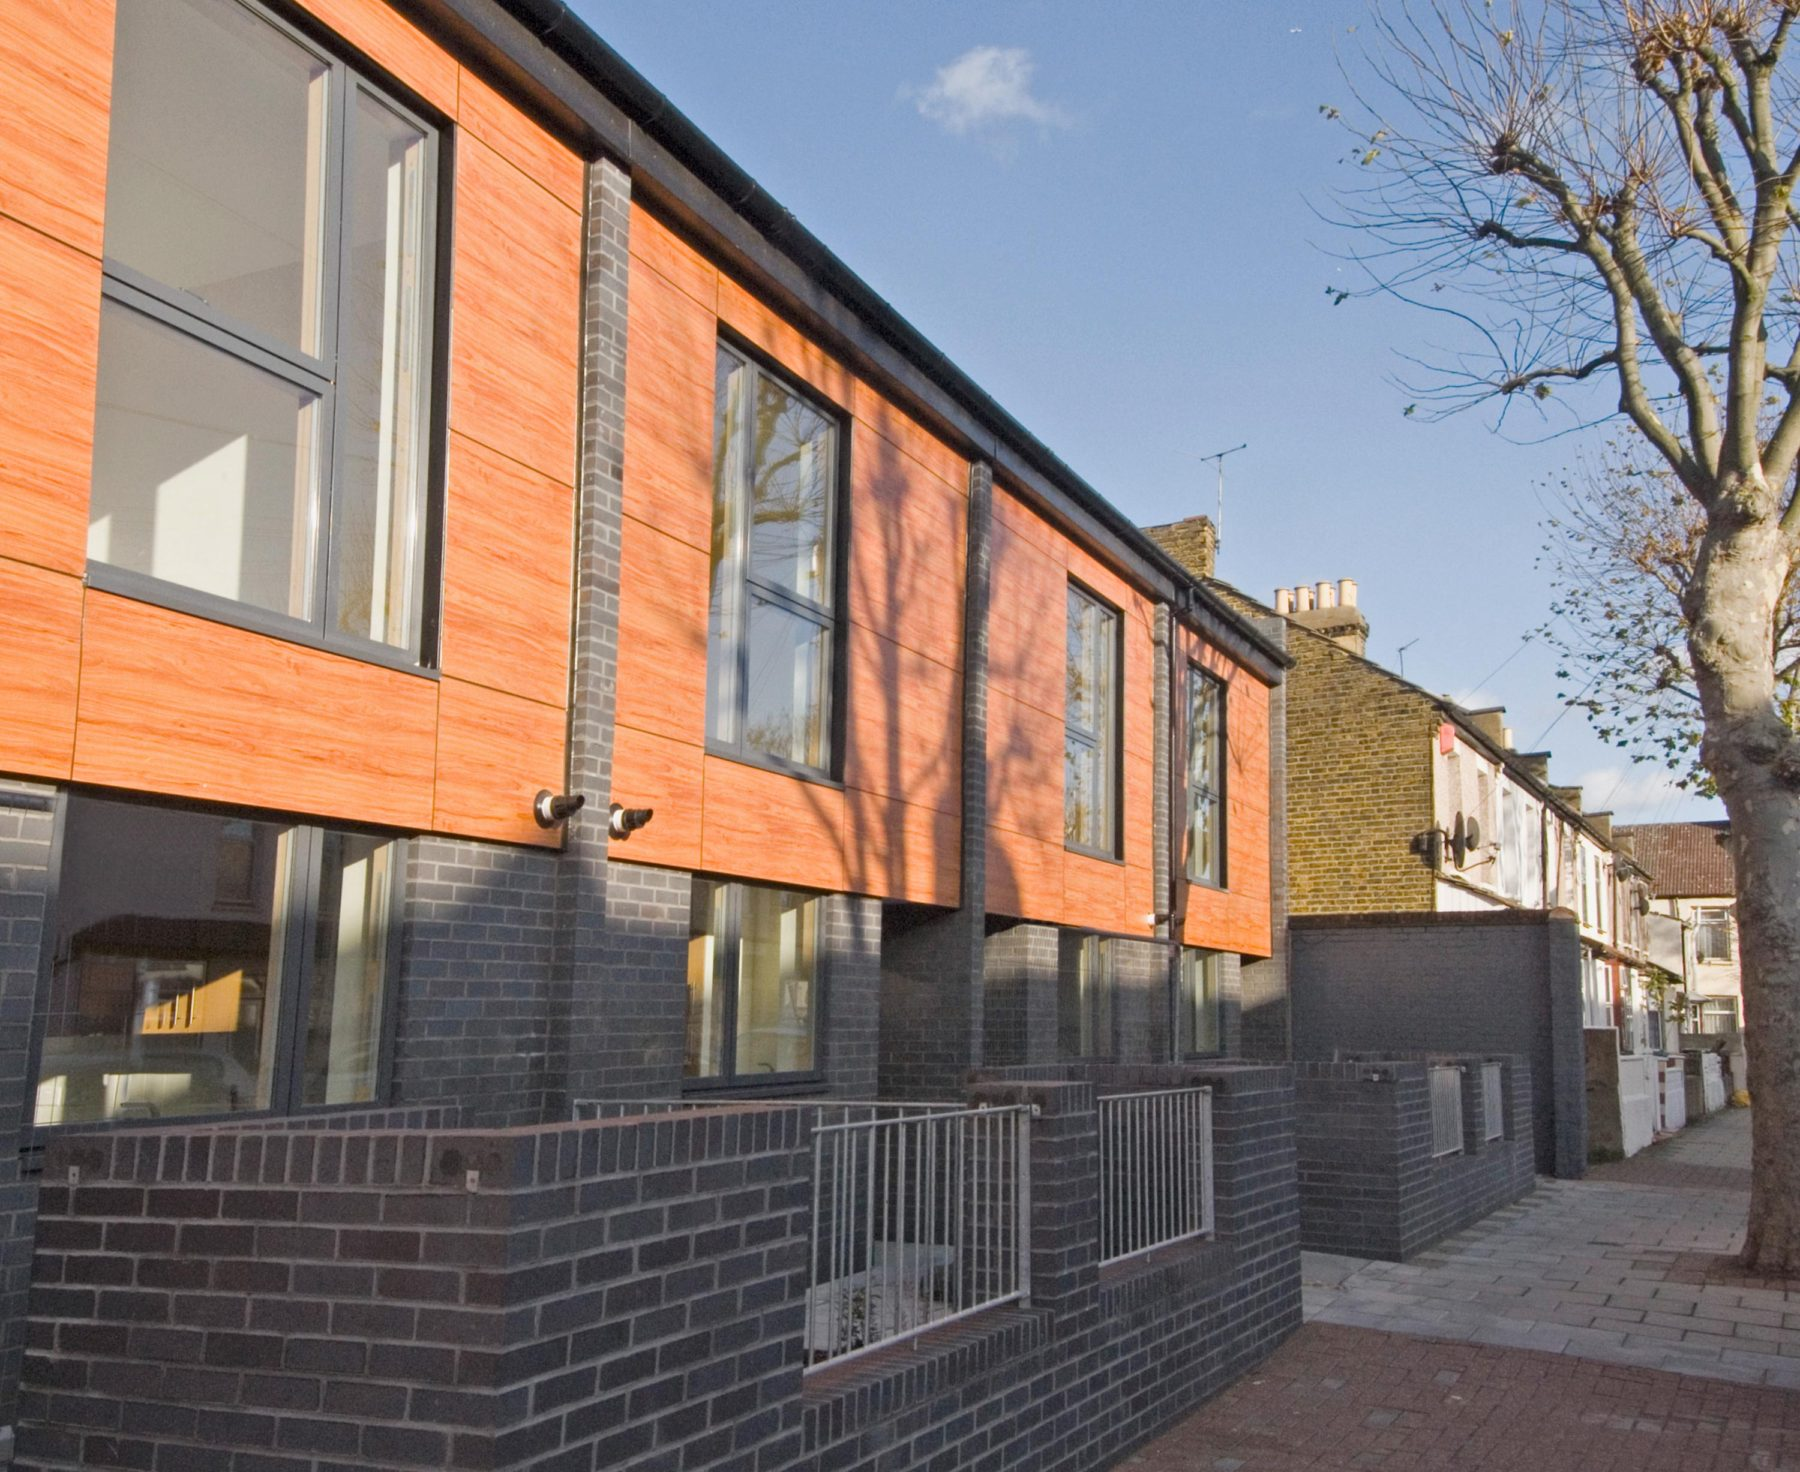 Romford Road 02 External Affordable Housing Houses